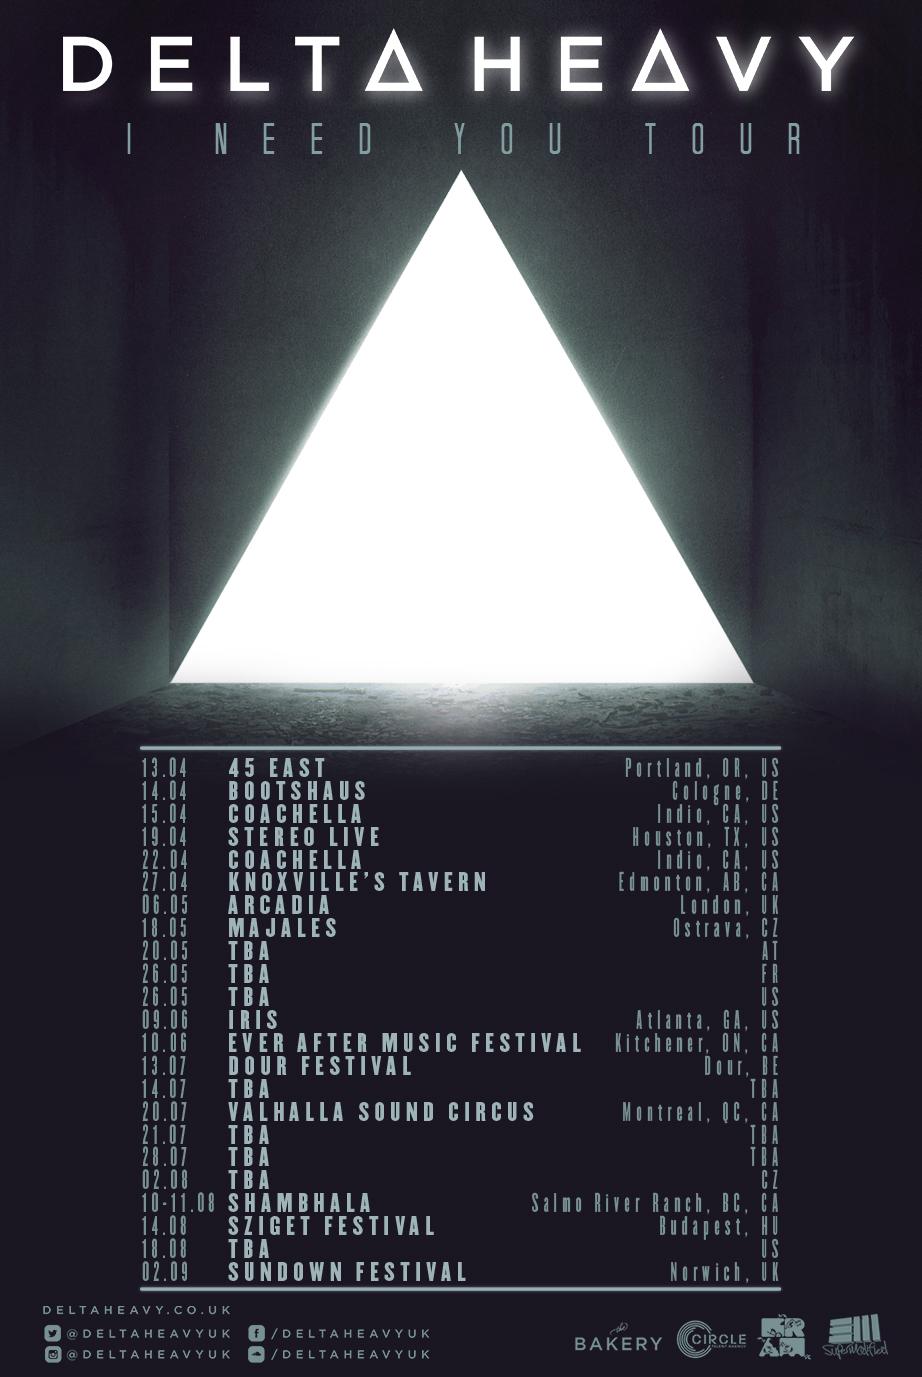 dh_SS_tour poster.jpg